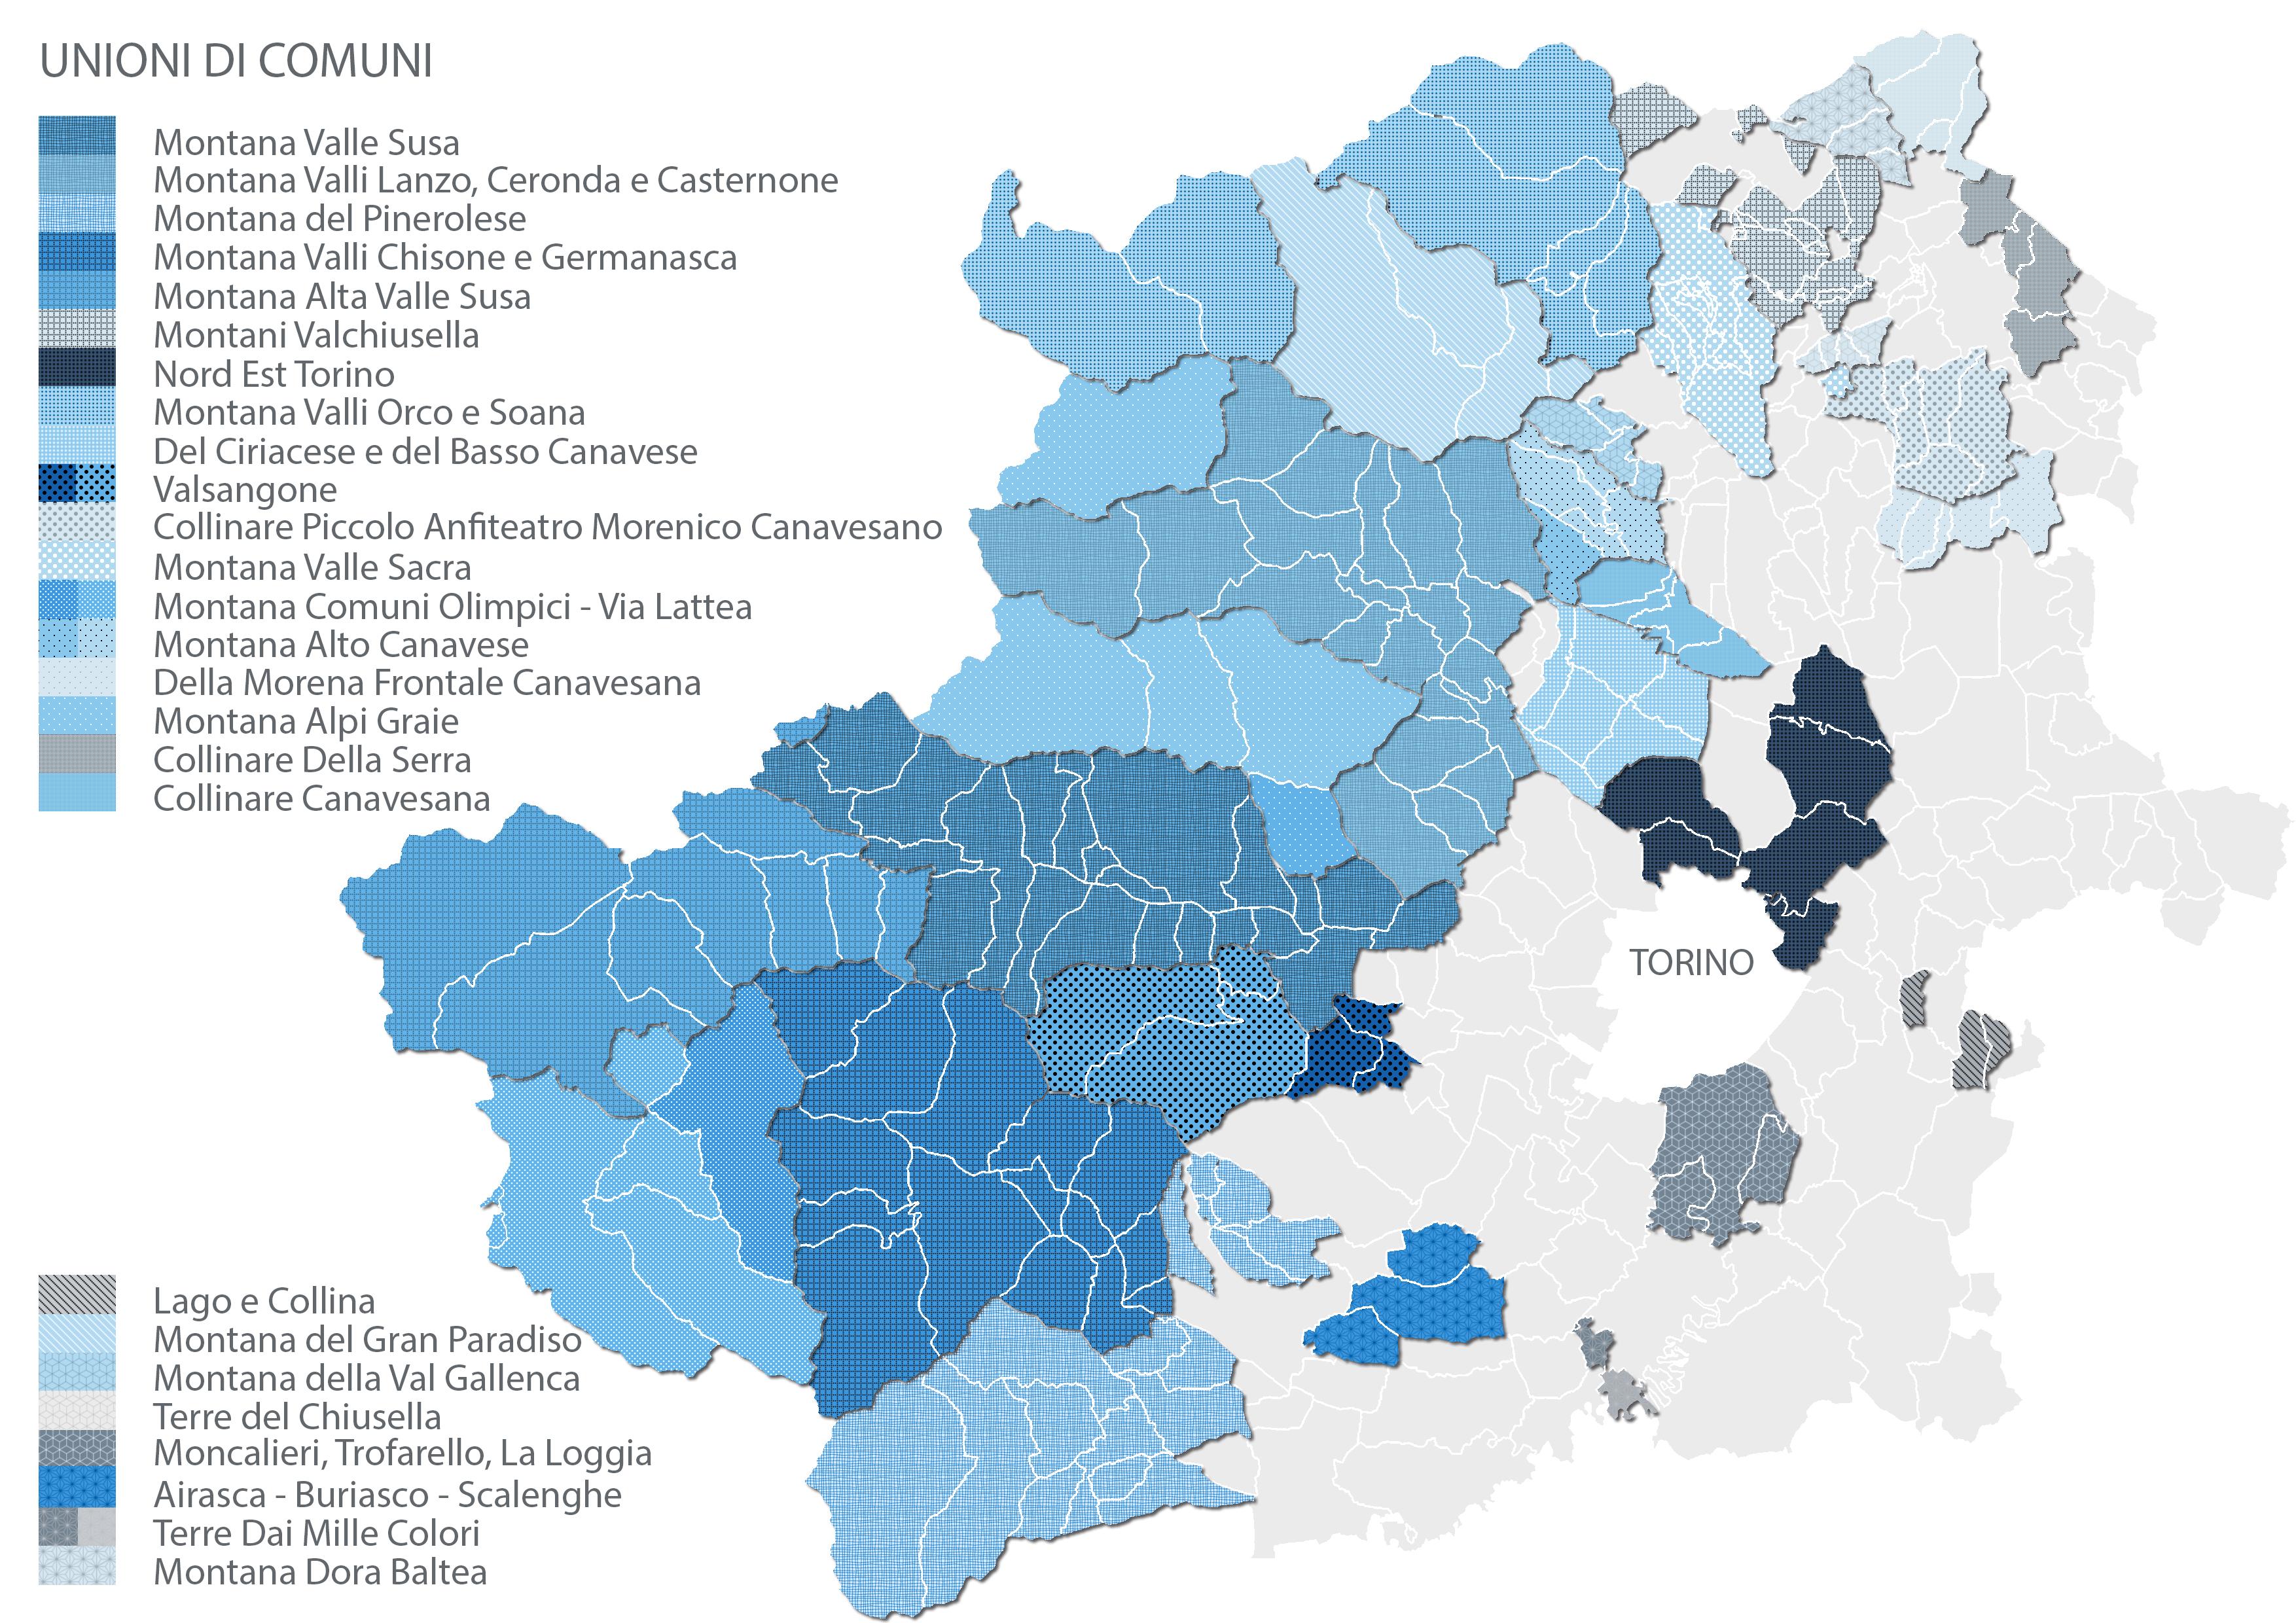 Unioni di Comuni - Città Metropolitana di Torino